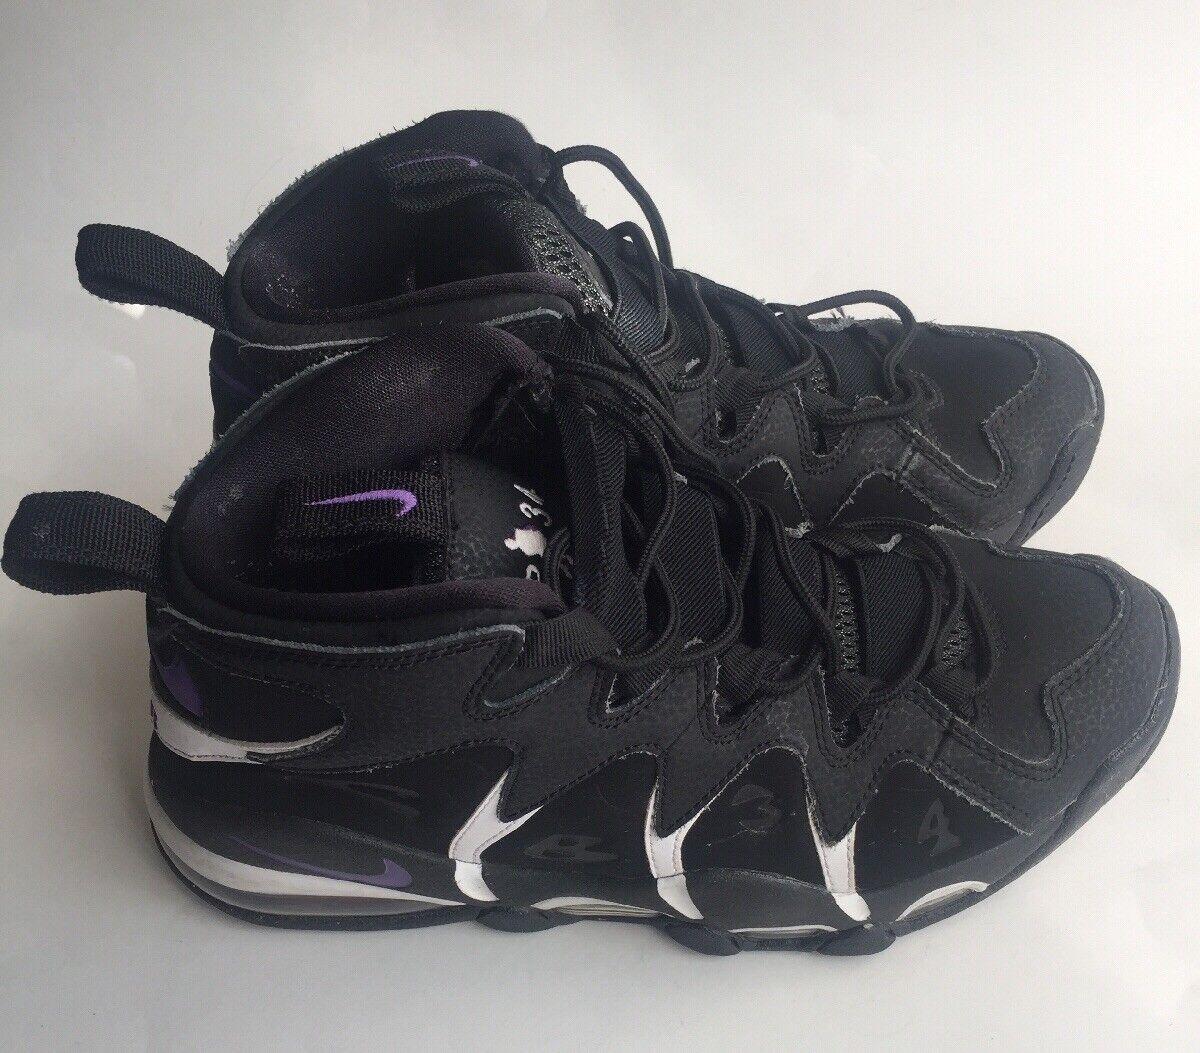 Nike barkley air max cb34 charles barkley Nike phoenix suns 414243-002 Uomo 8 donne 9,5 c3eddf